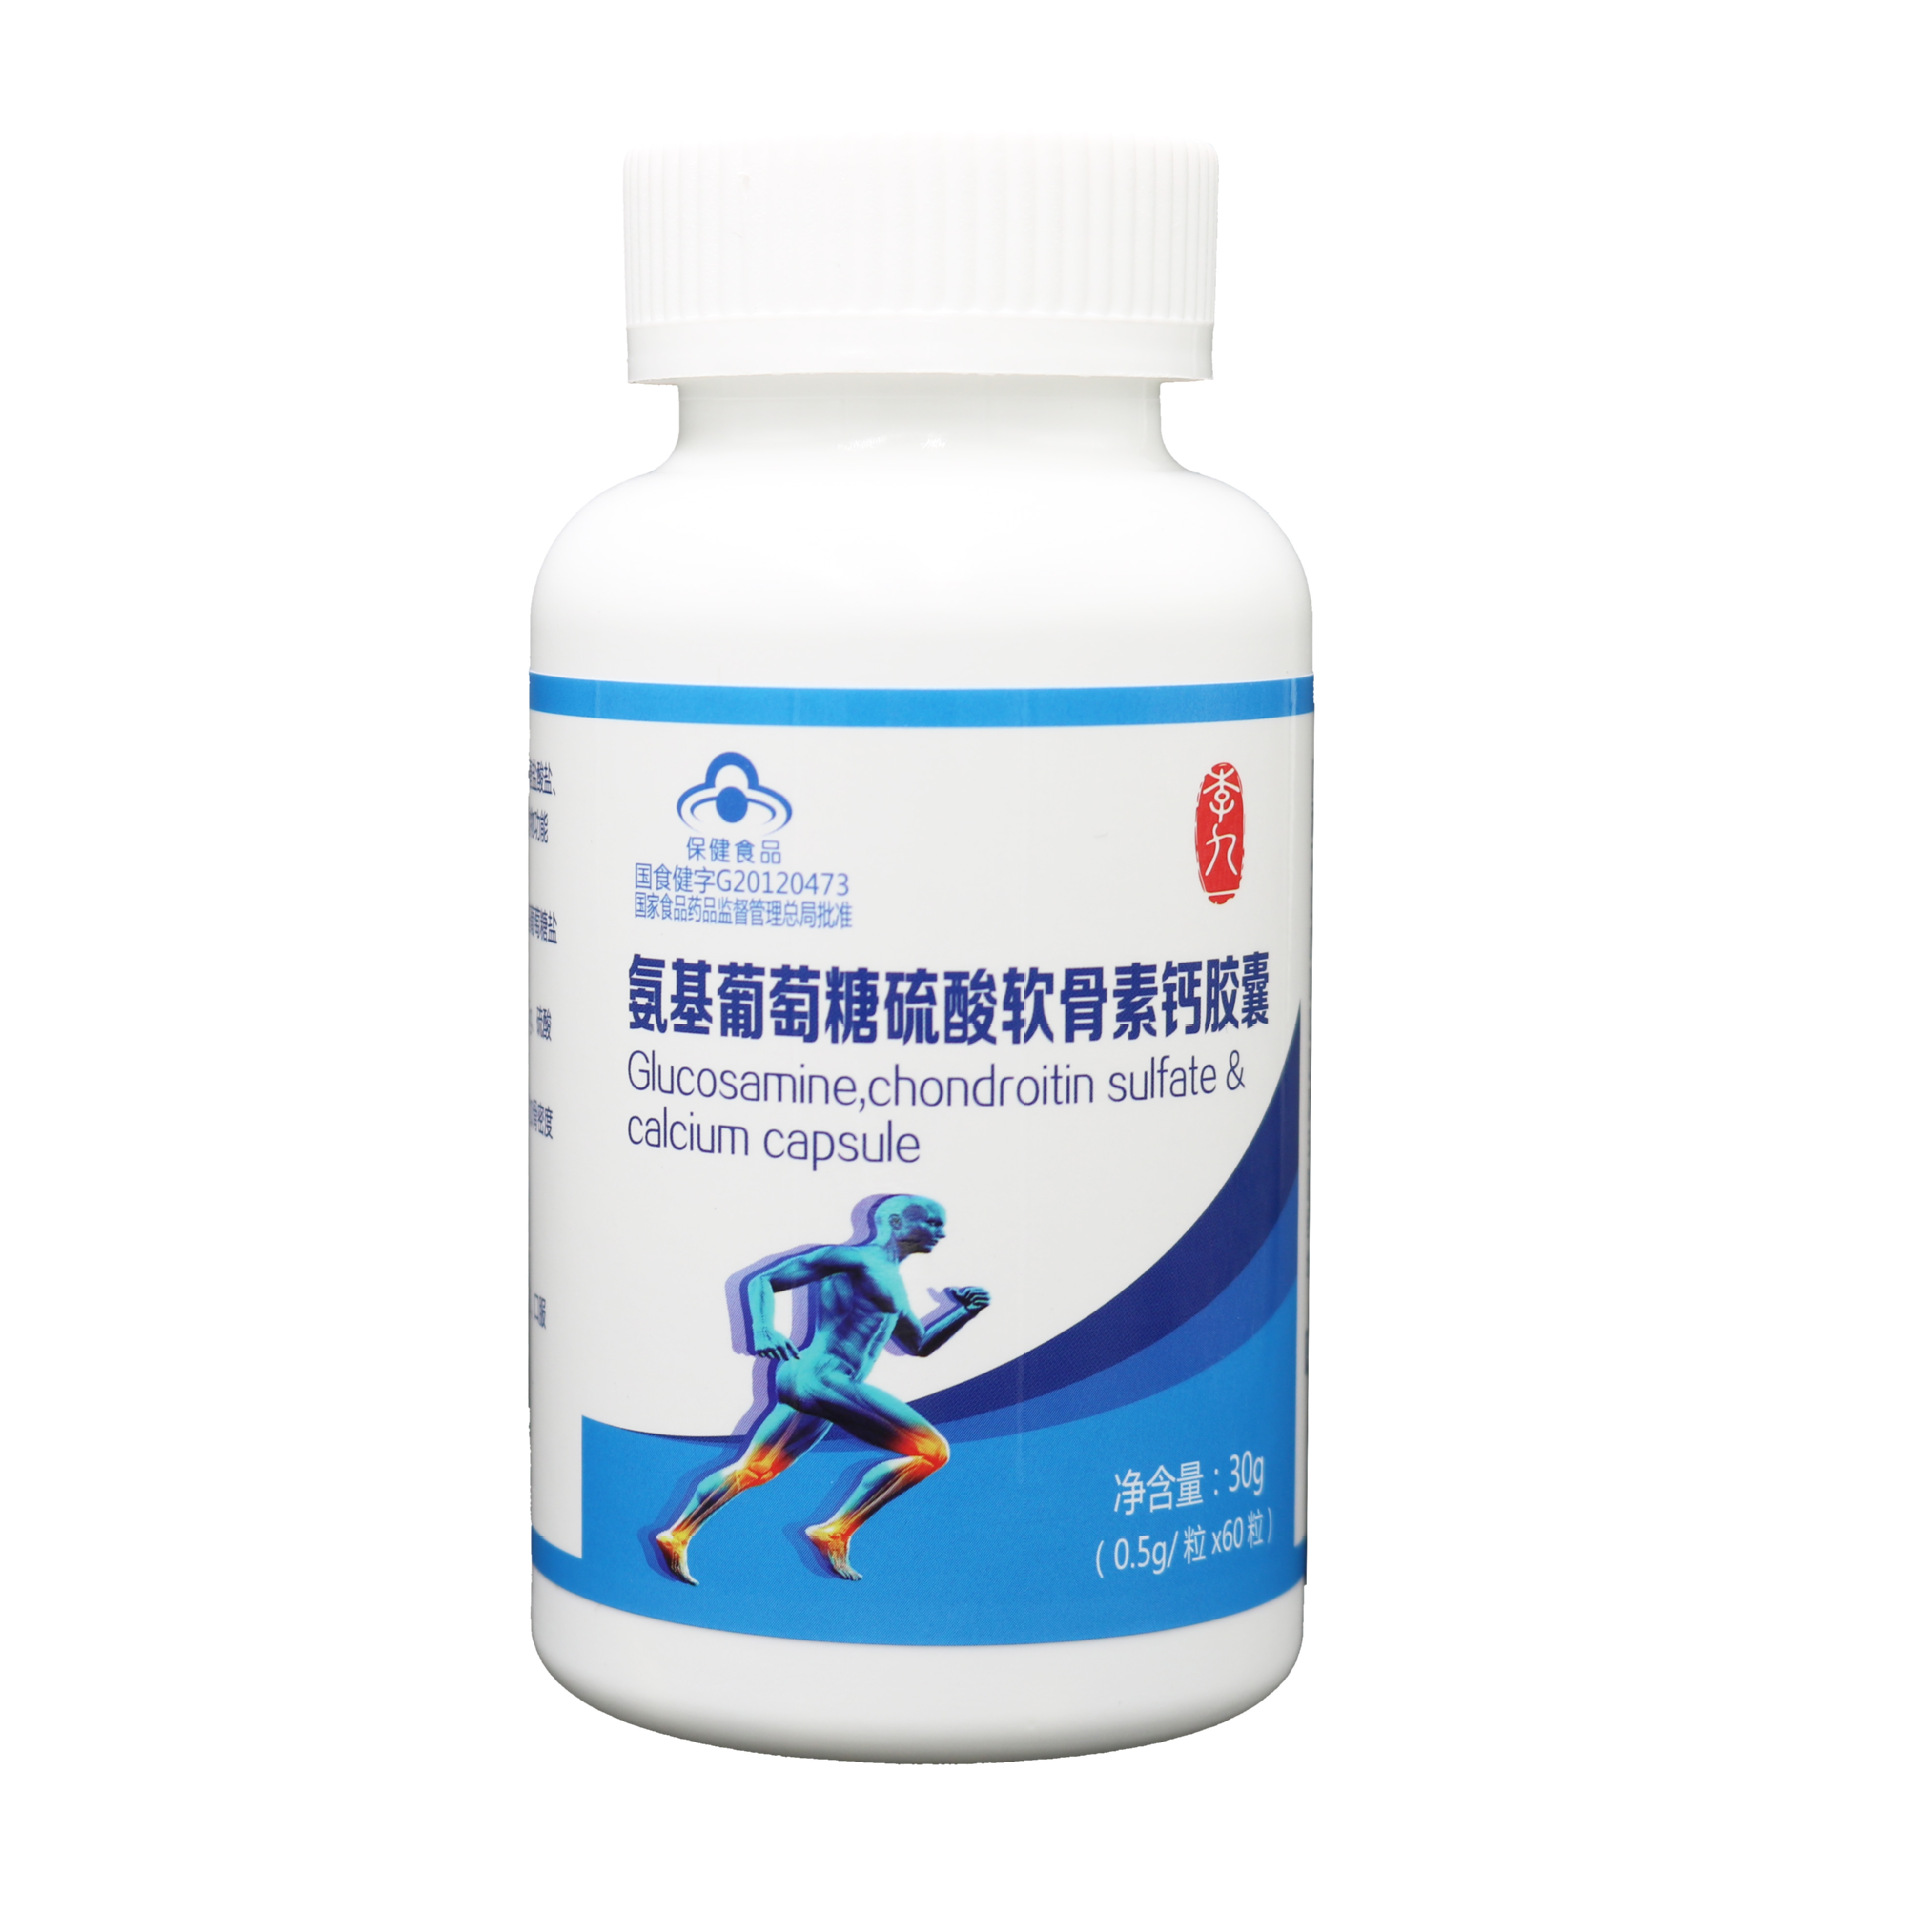 Glucosamine Chondroitin Sulfate Calcium Carbonate Capsules 60 Pills Aminose Chondroitin Calcium Tablets Health Care Products